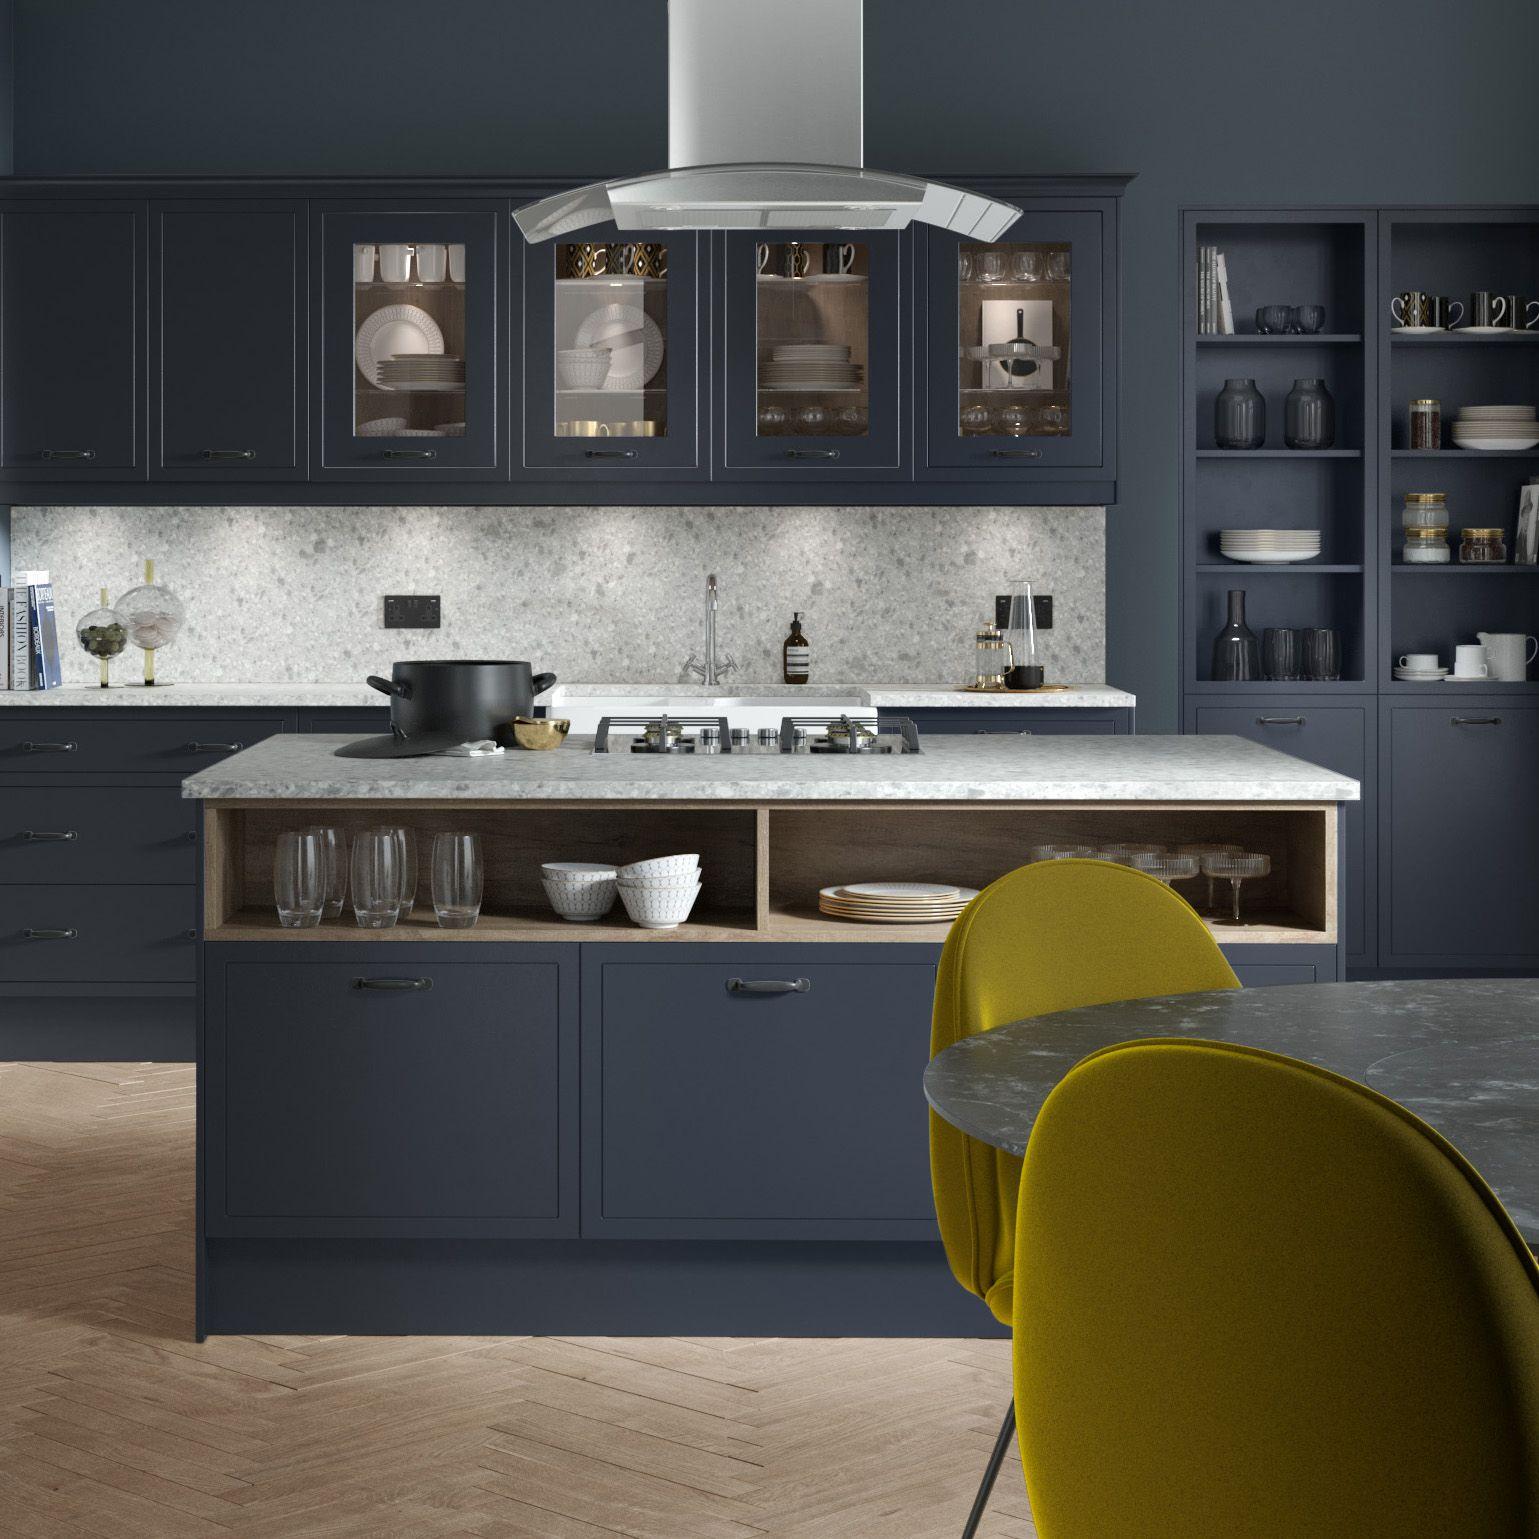 Sleek metallics, marble worktops and glass fronted